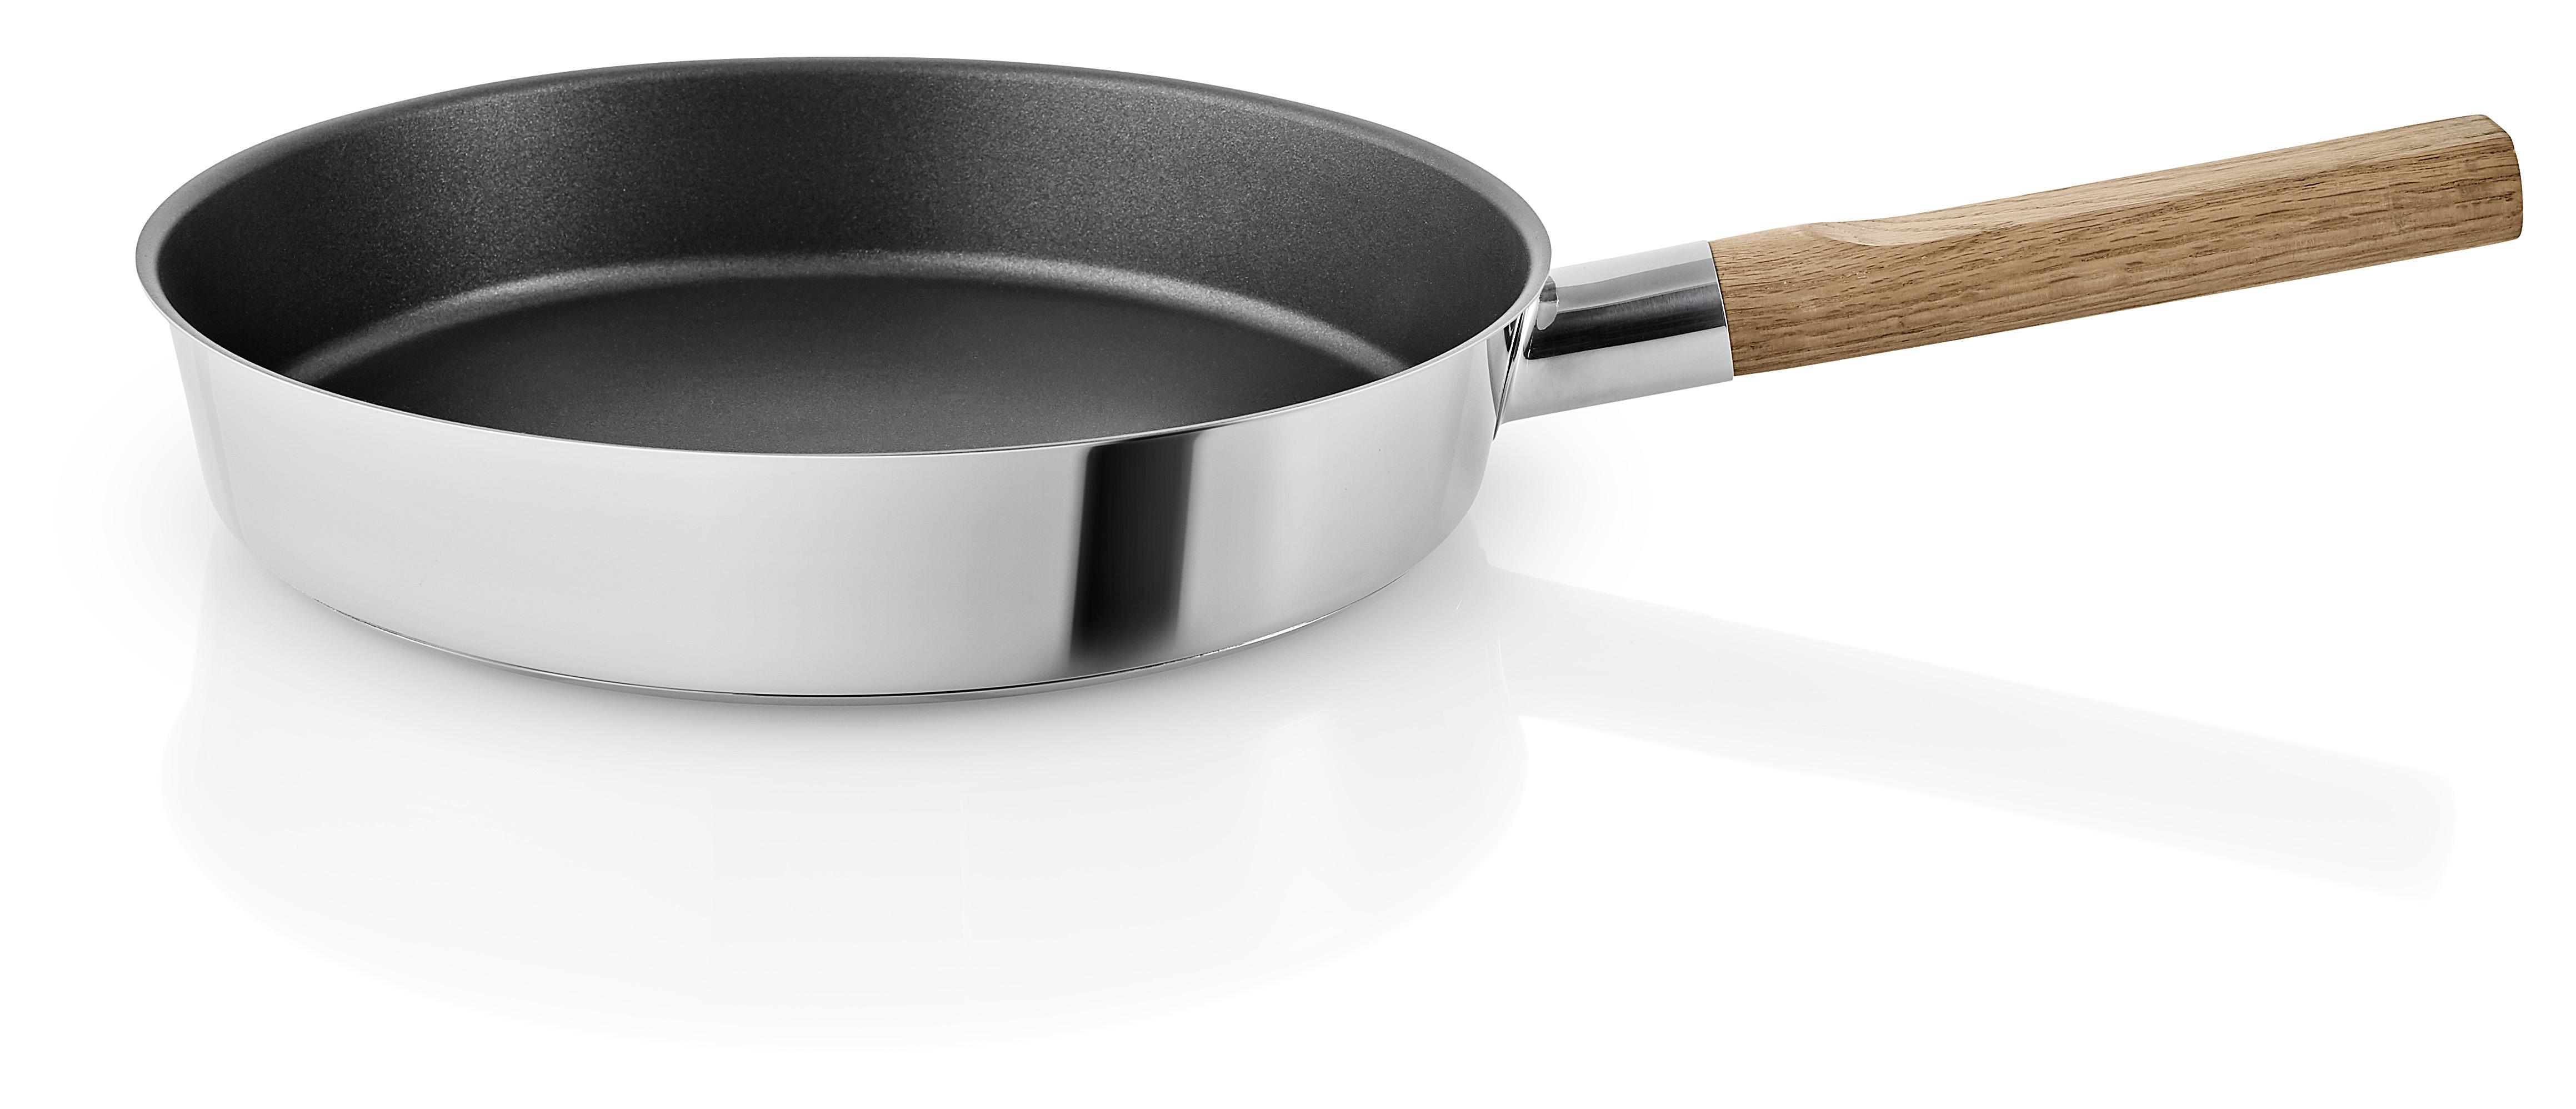 Eva Solo - Nordic Kitchen Bratpfanne 28 cm (281328)